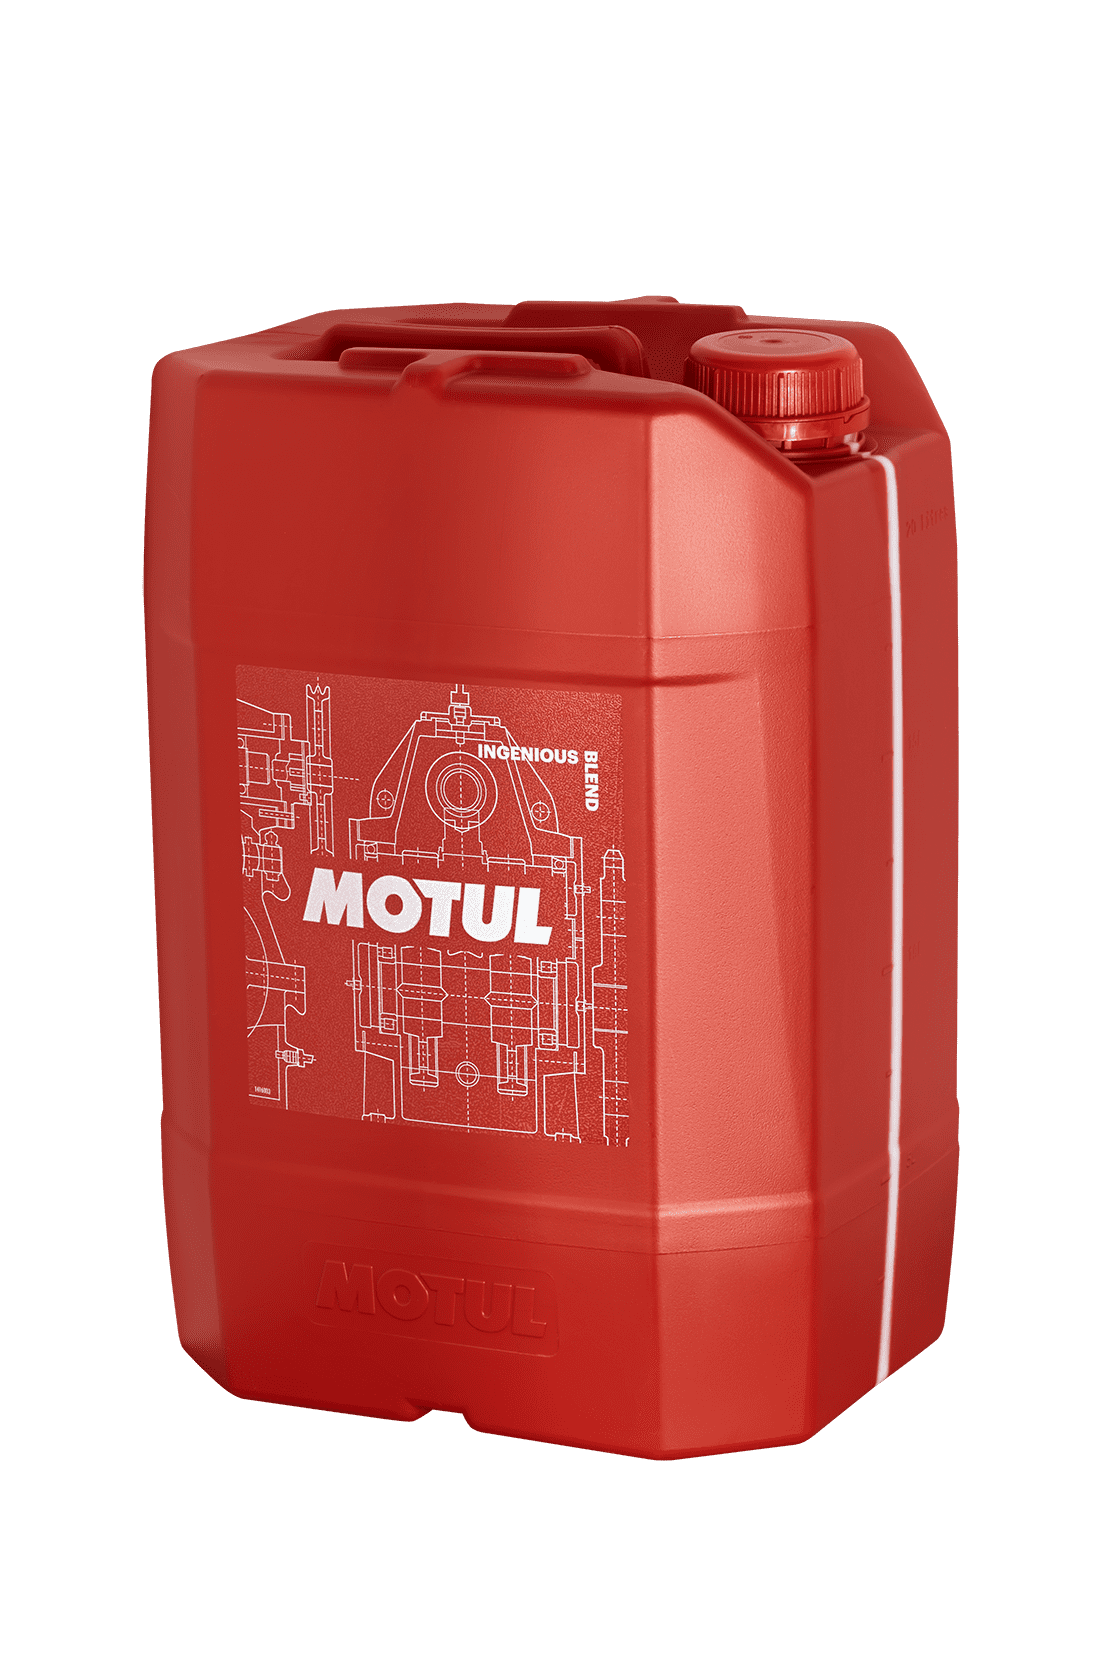 Motul Inugel Expert Ultra 20L